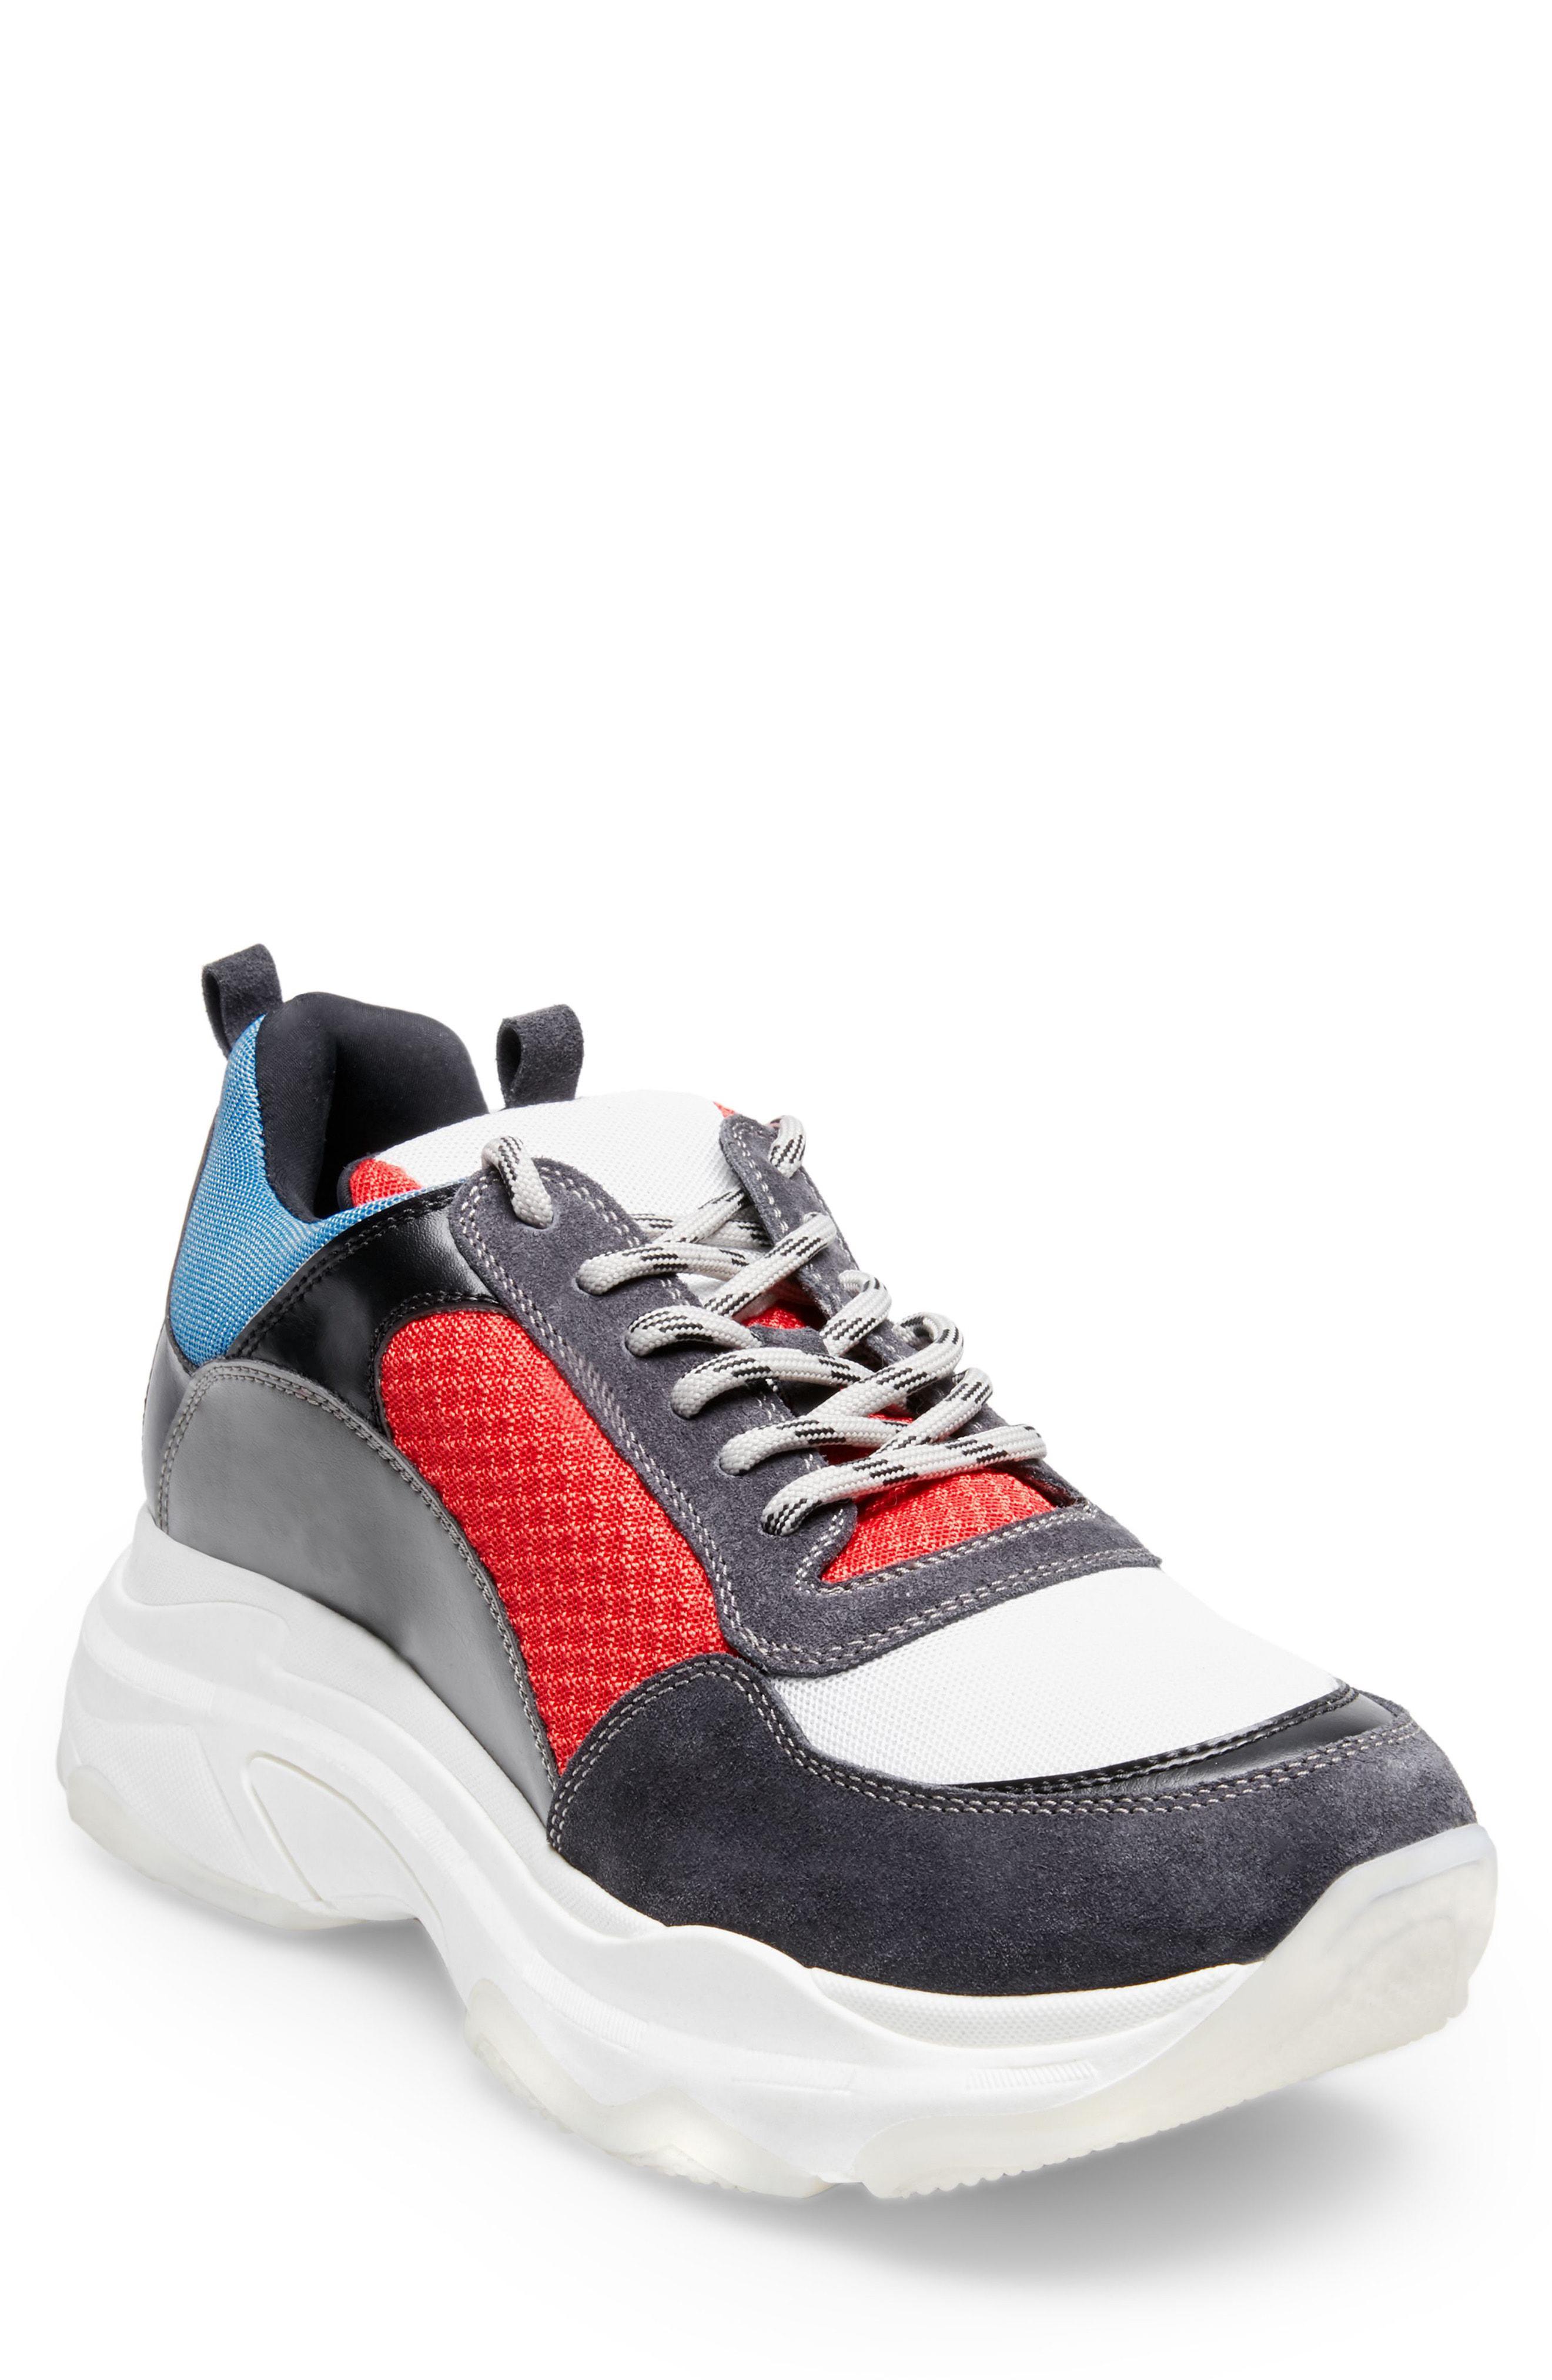 15acddb0d21 Steve Madden Multicolor Russell Platform Sneaker for men